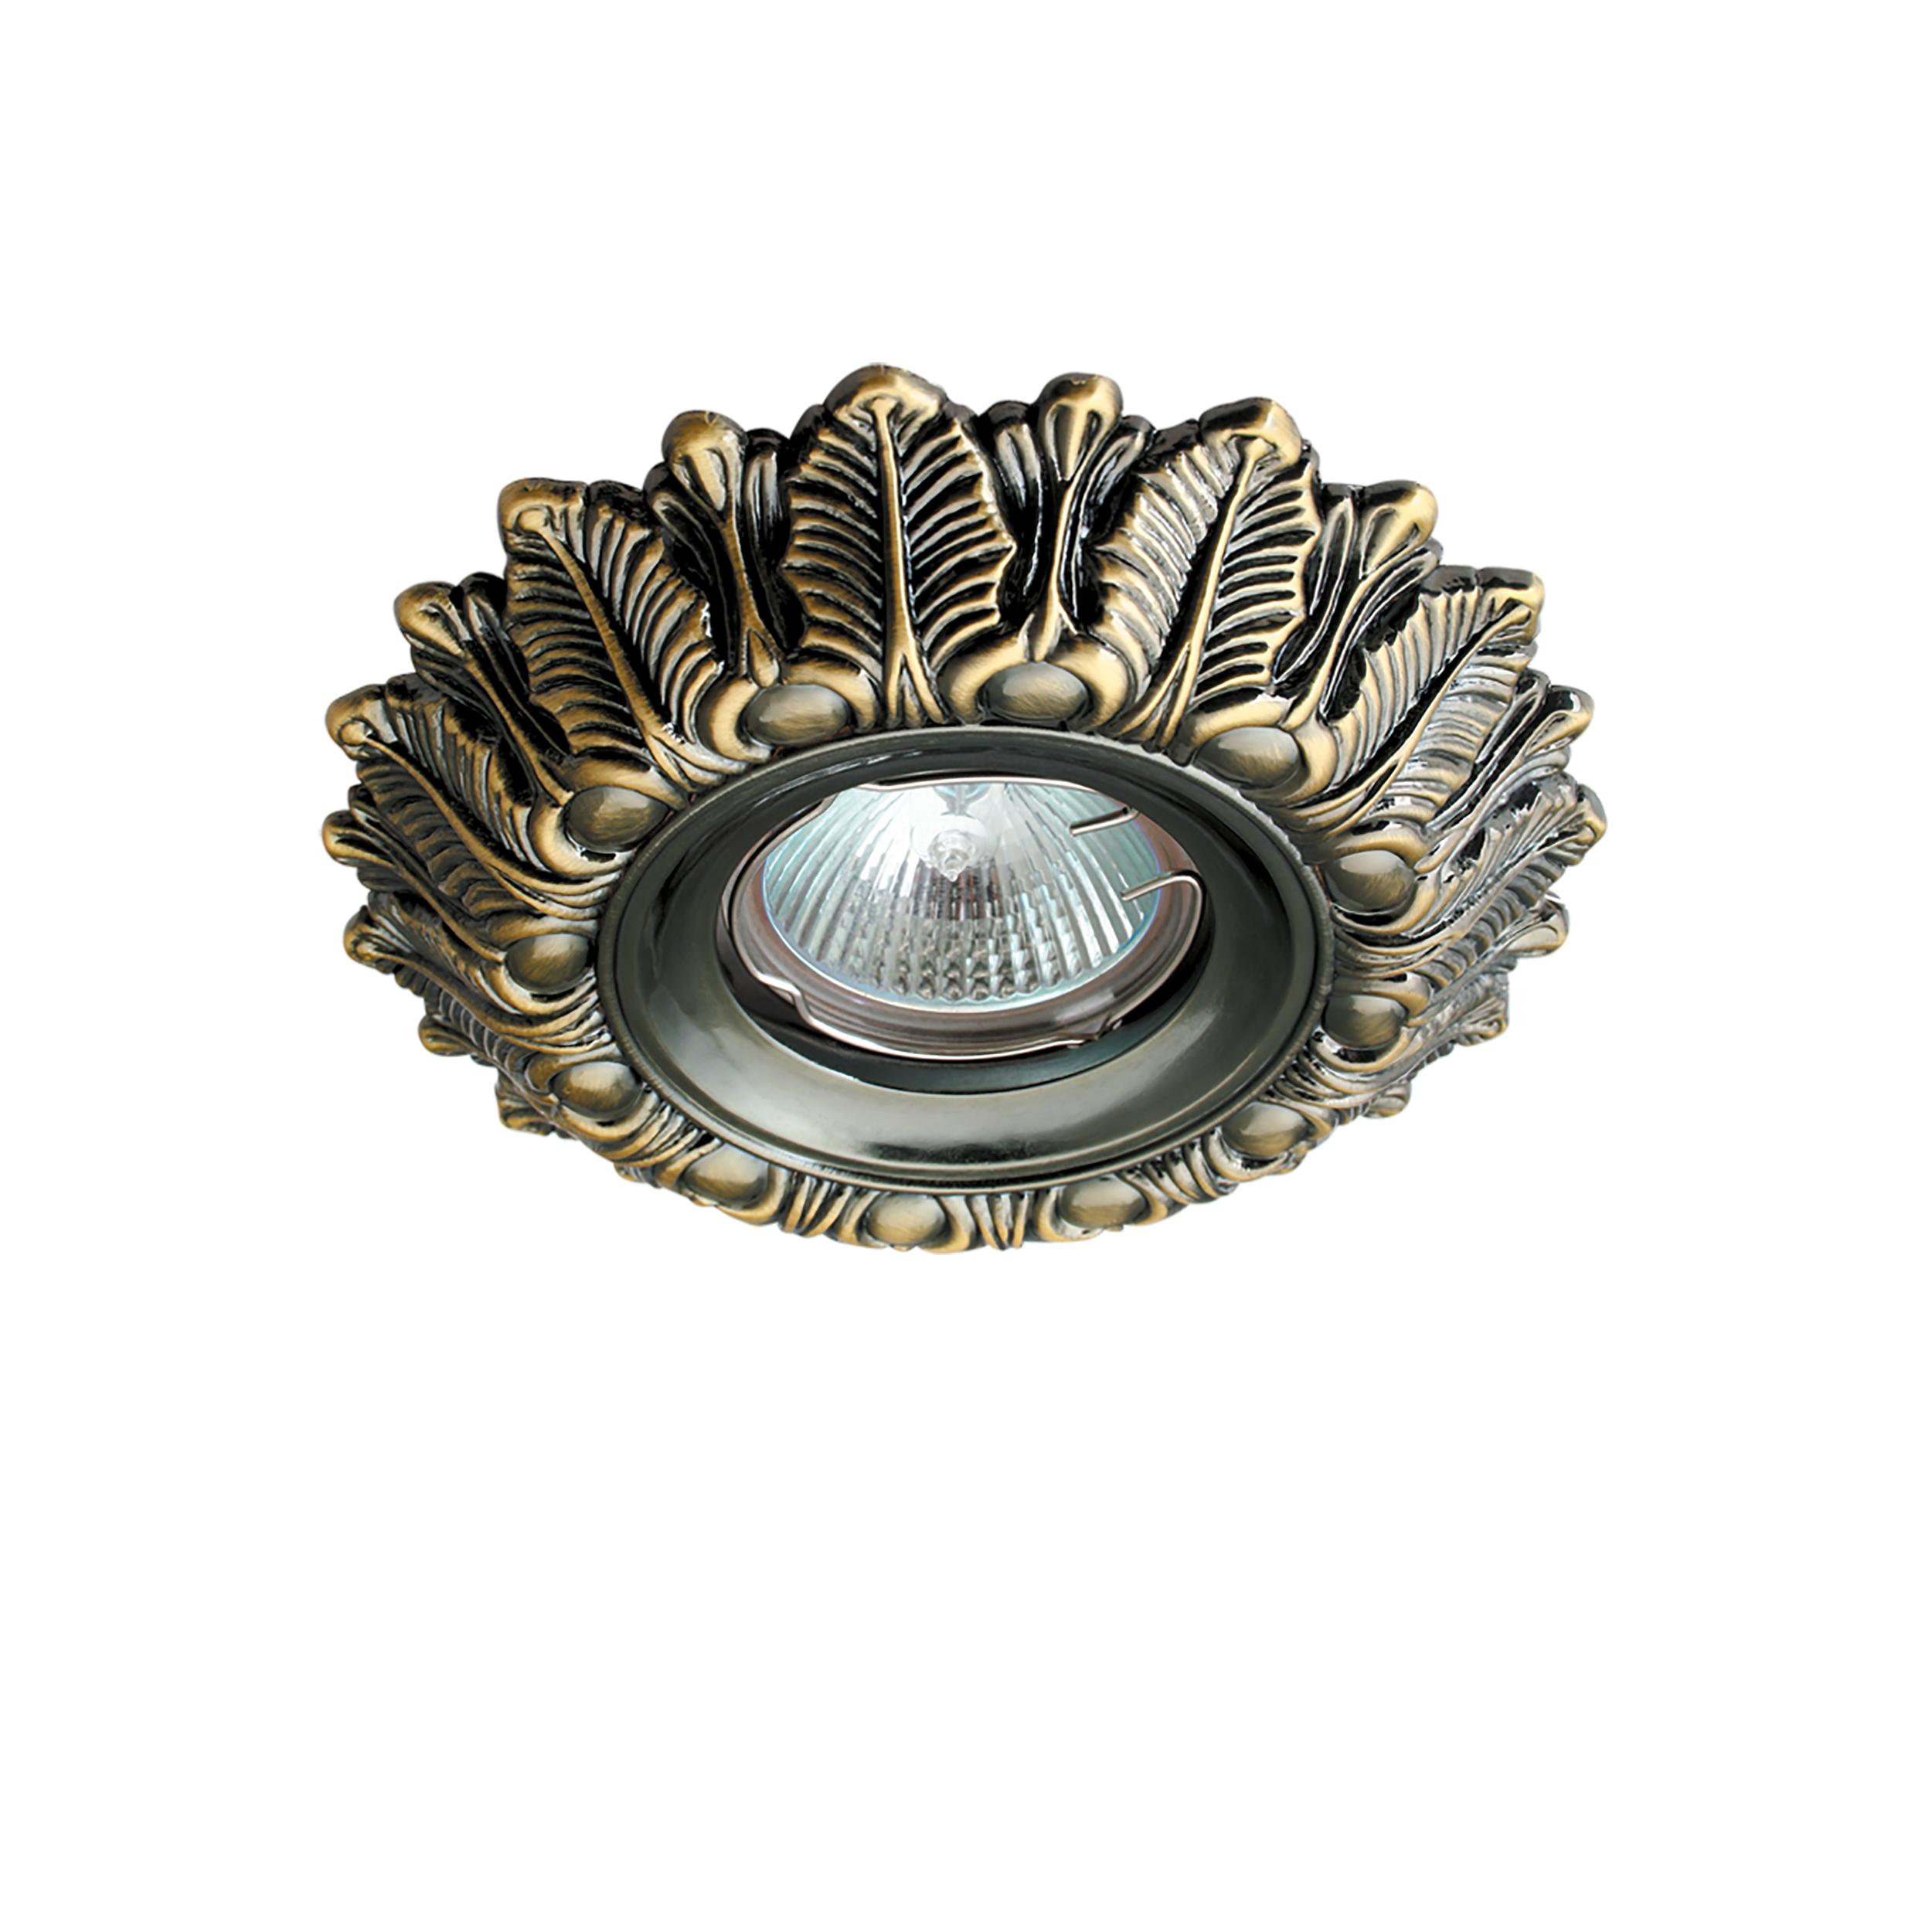 Встраиваемый светильник Lightstar Helio 011198, 1xGU5.3x50W, бронза, металл - фото 1